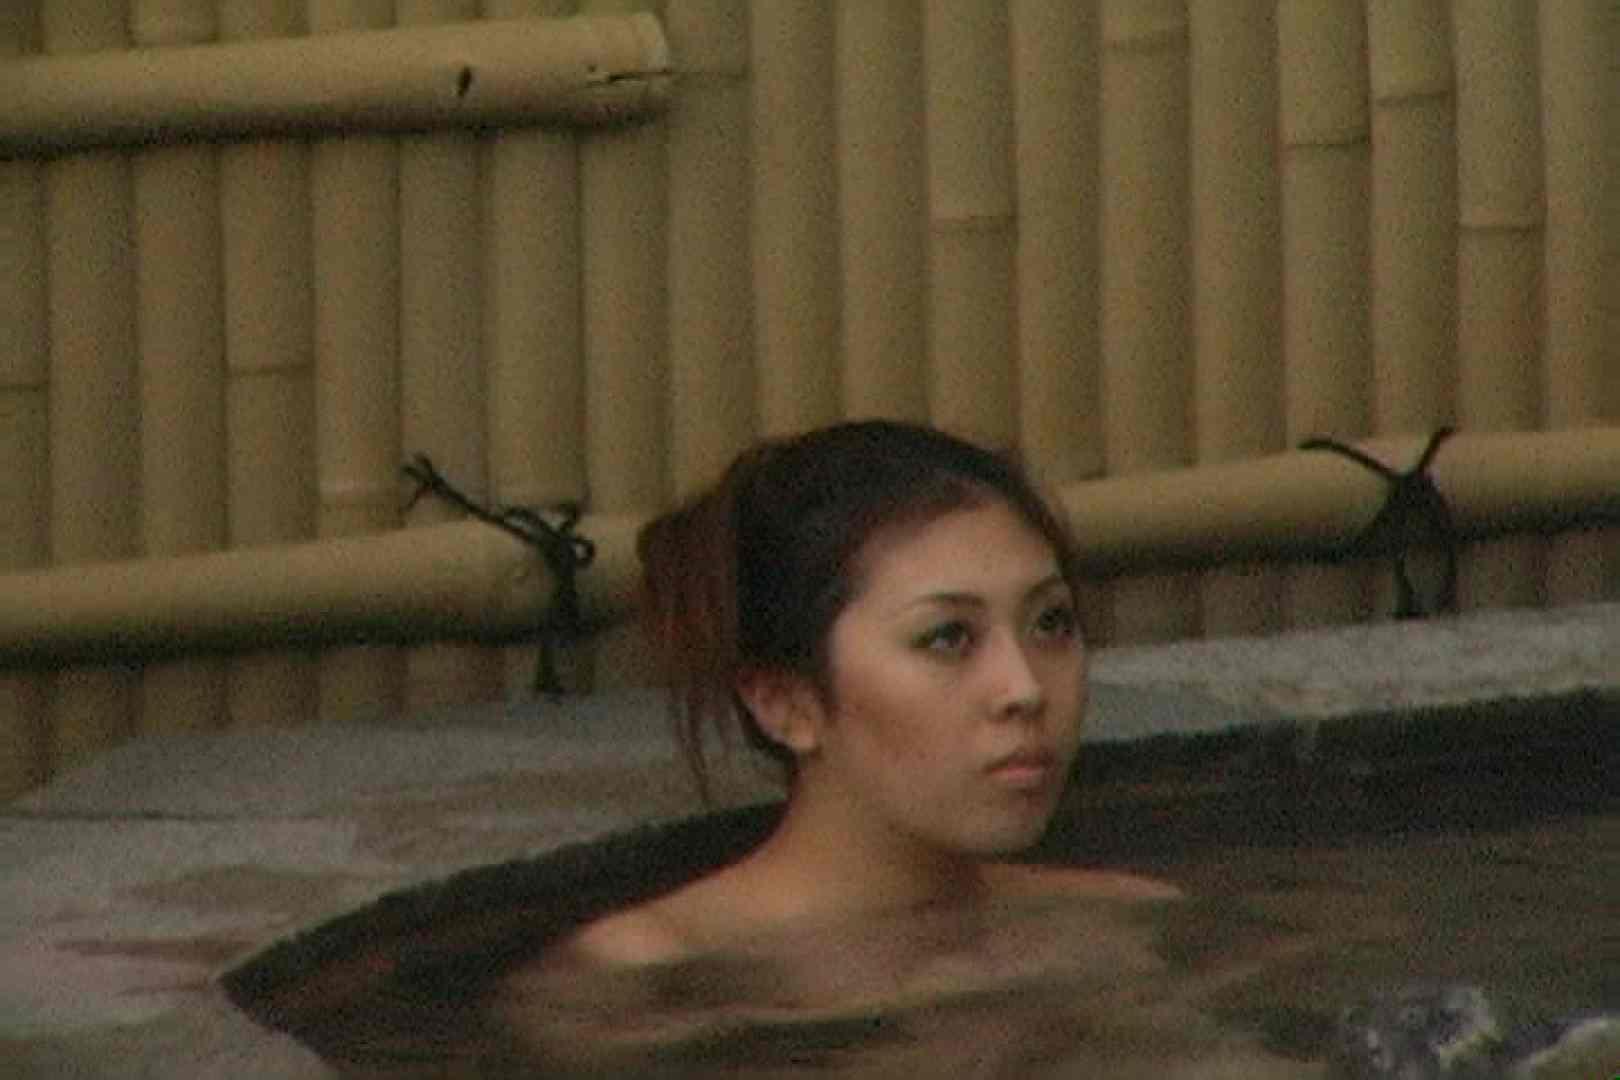 Aquaな露天風呂Vol.24 露天   HなOL  70pic 50